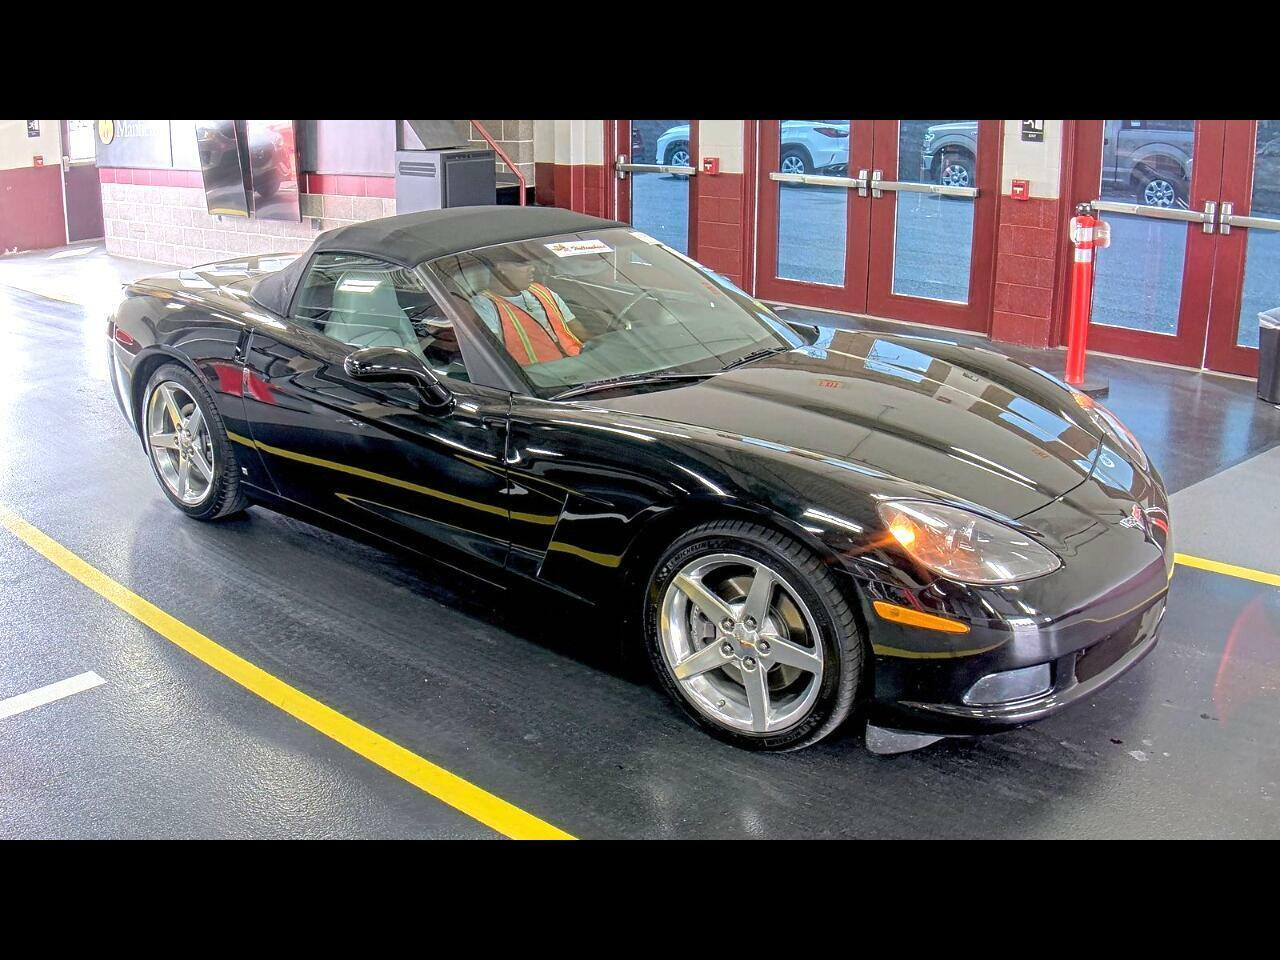 2006 Black Chevrolet Corvette Convertible  | C6 Corvette Photo 2